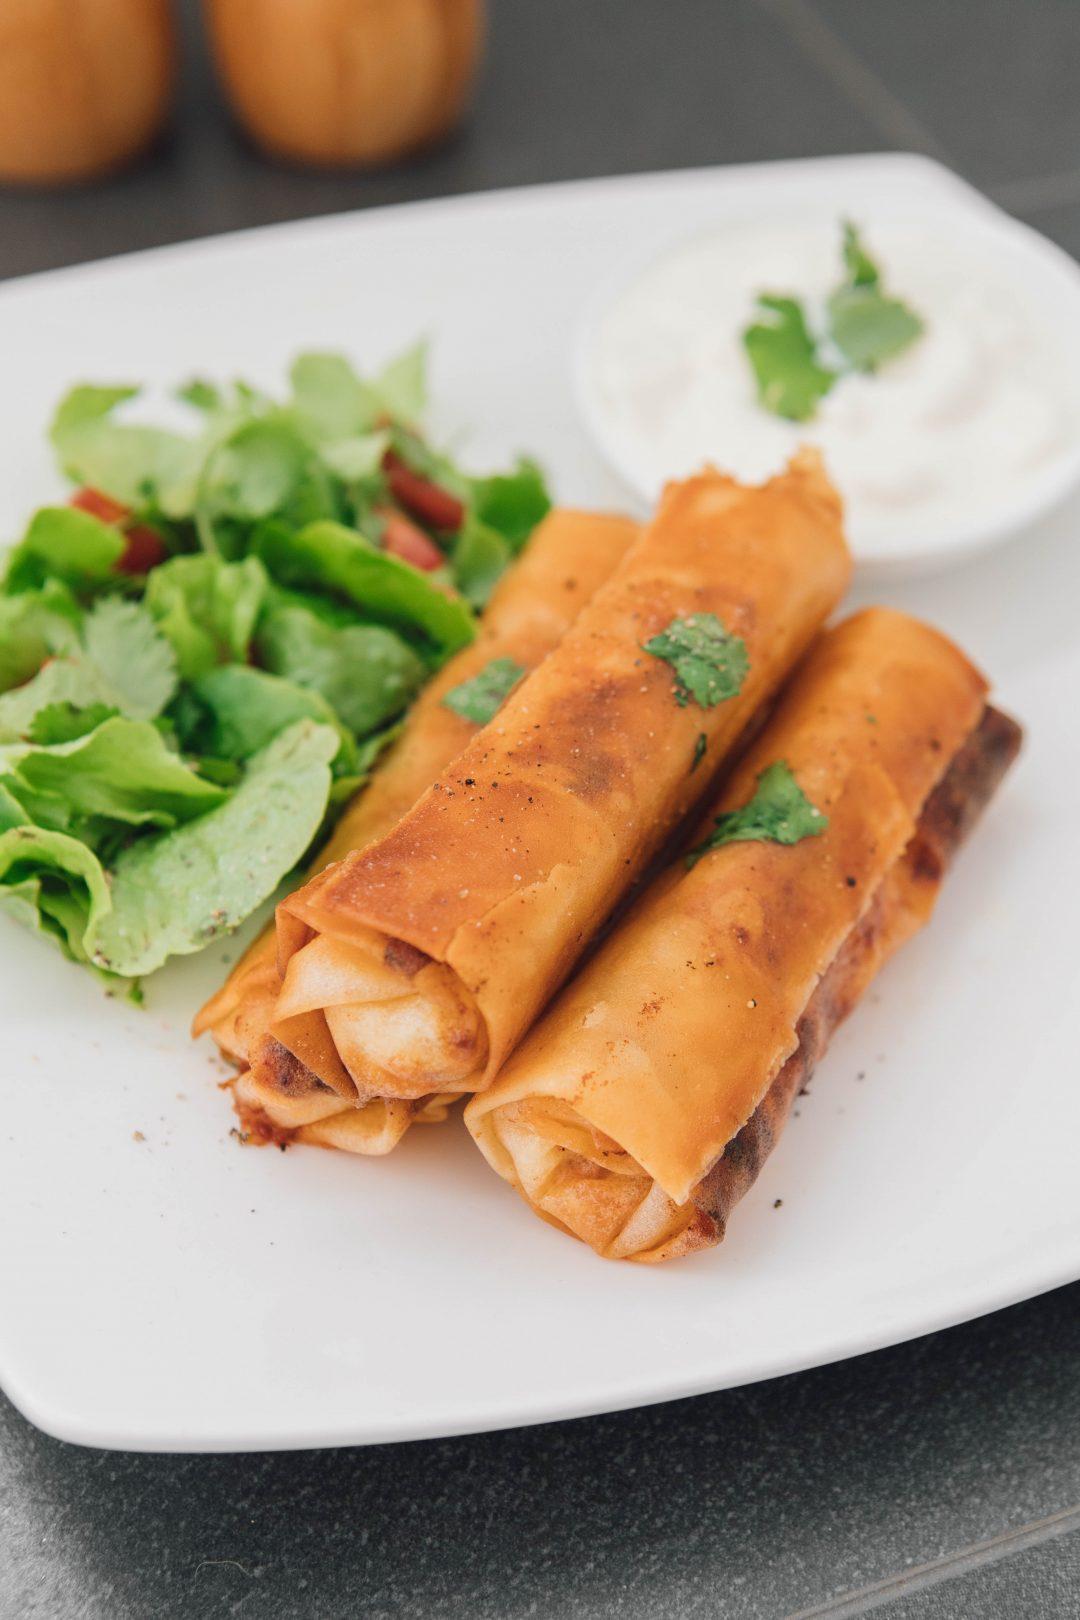 Cheesesteak Egg Roll Taco